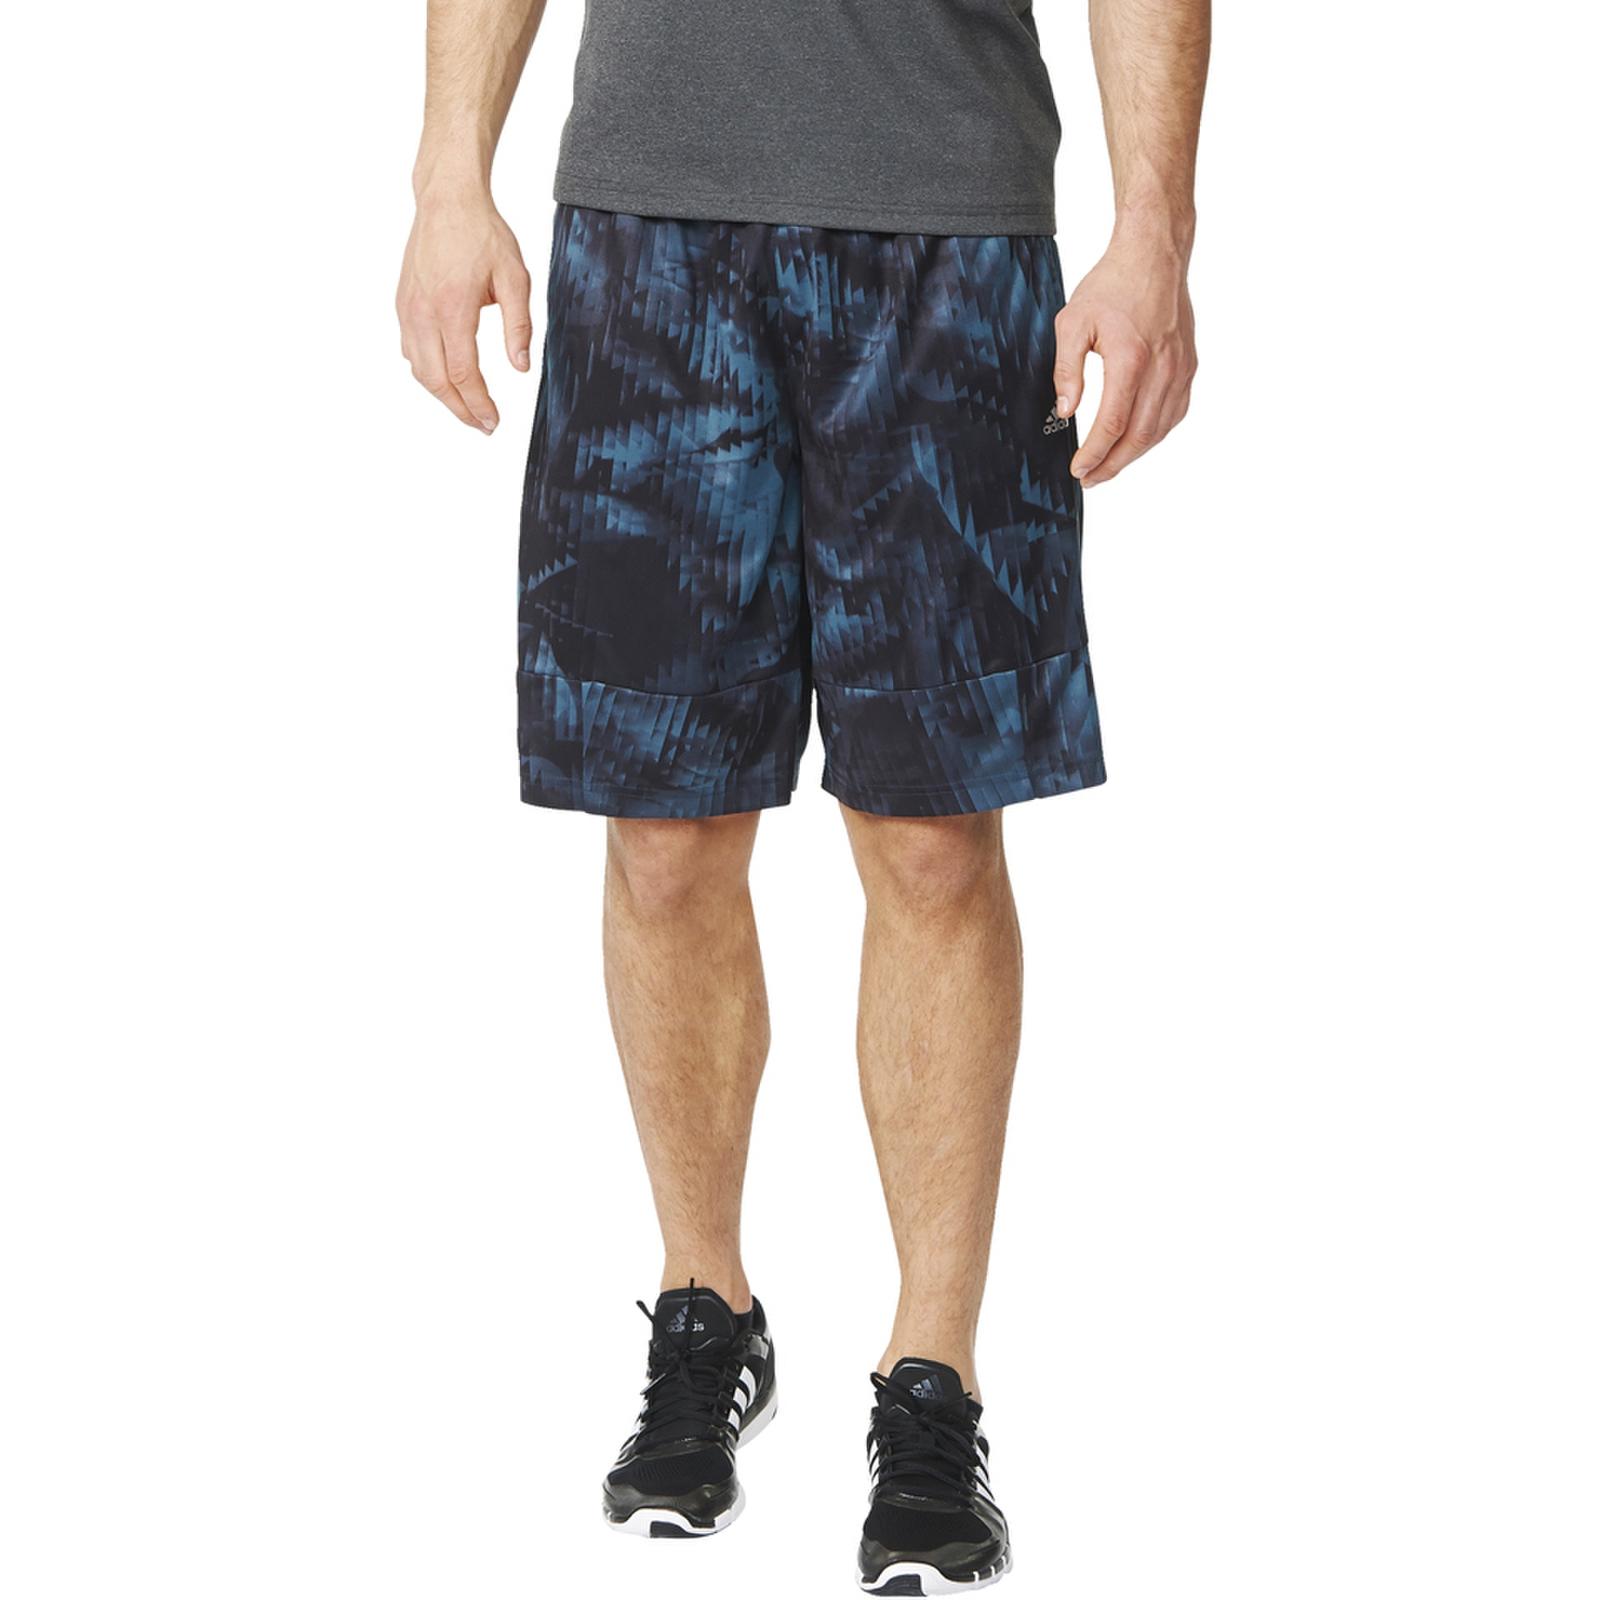 new style befc3 9c9f0 adidas Men s Swat Training Shorts - Dark Blue Sports   Leisure   TheHut.com